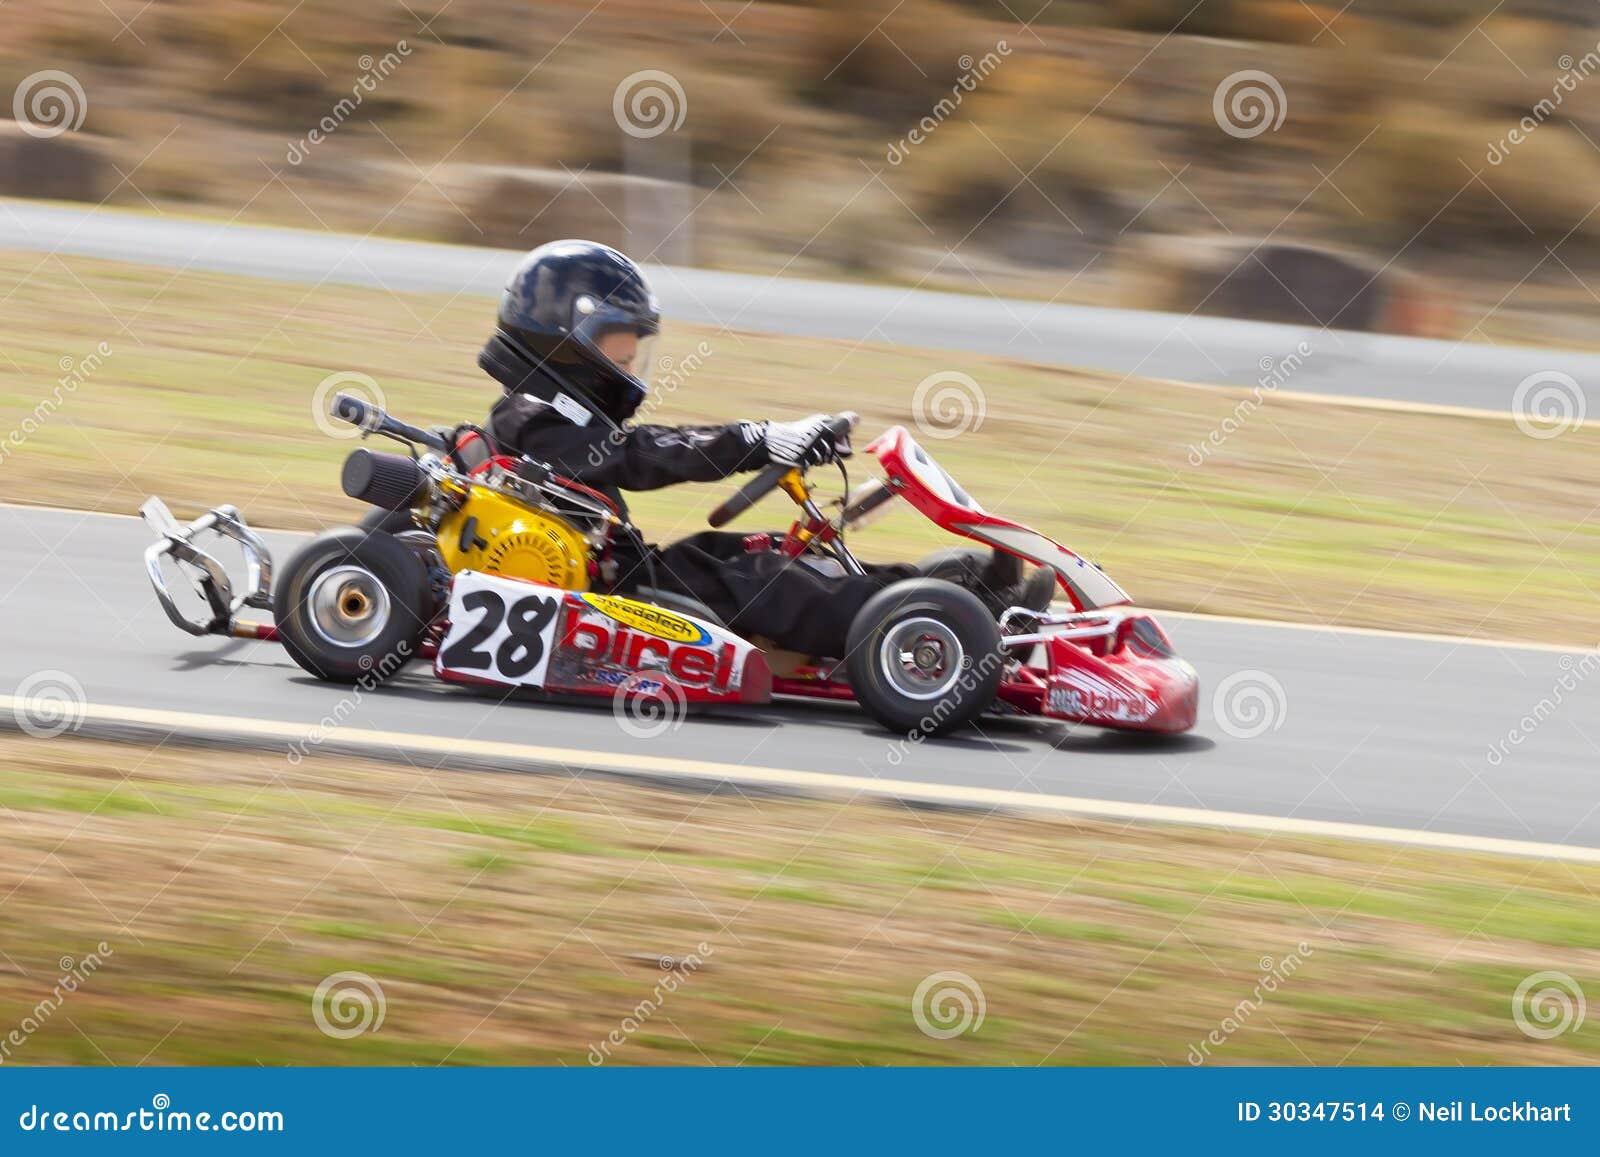 Northern Nevada Kids Kart Club Racing Editorial Stock Image - Image